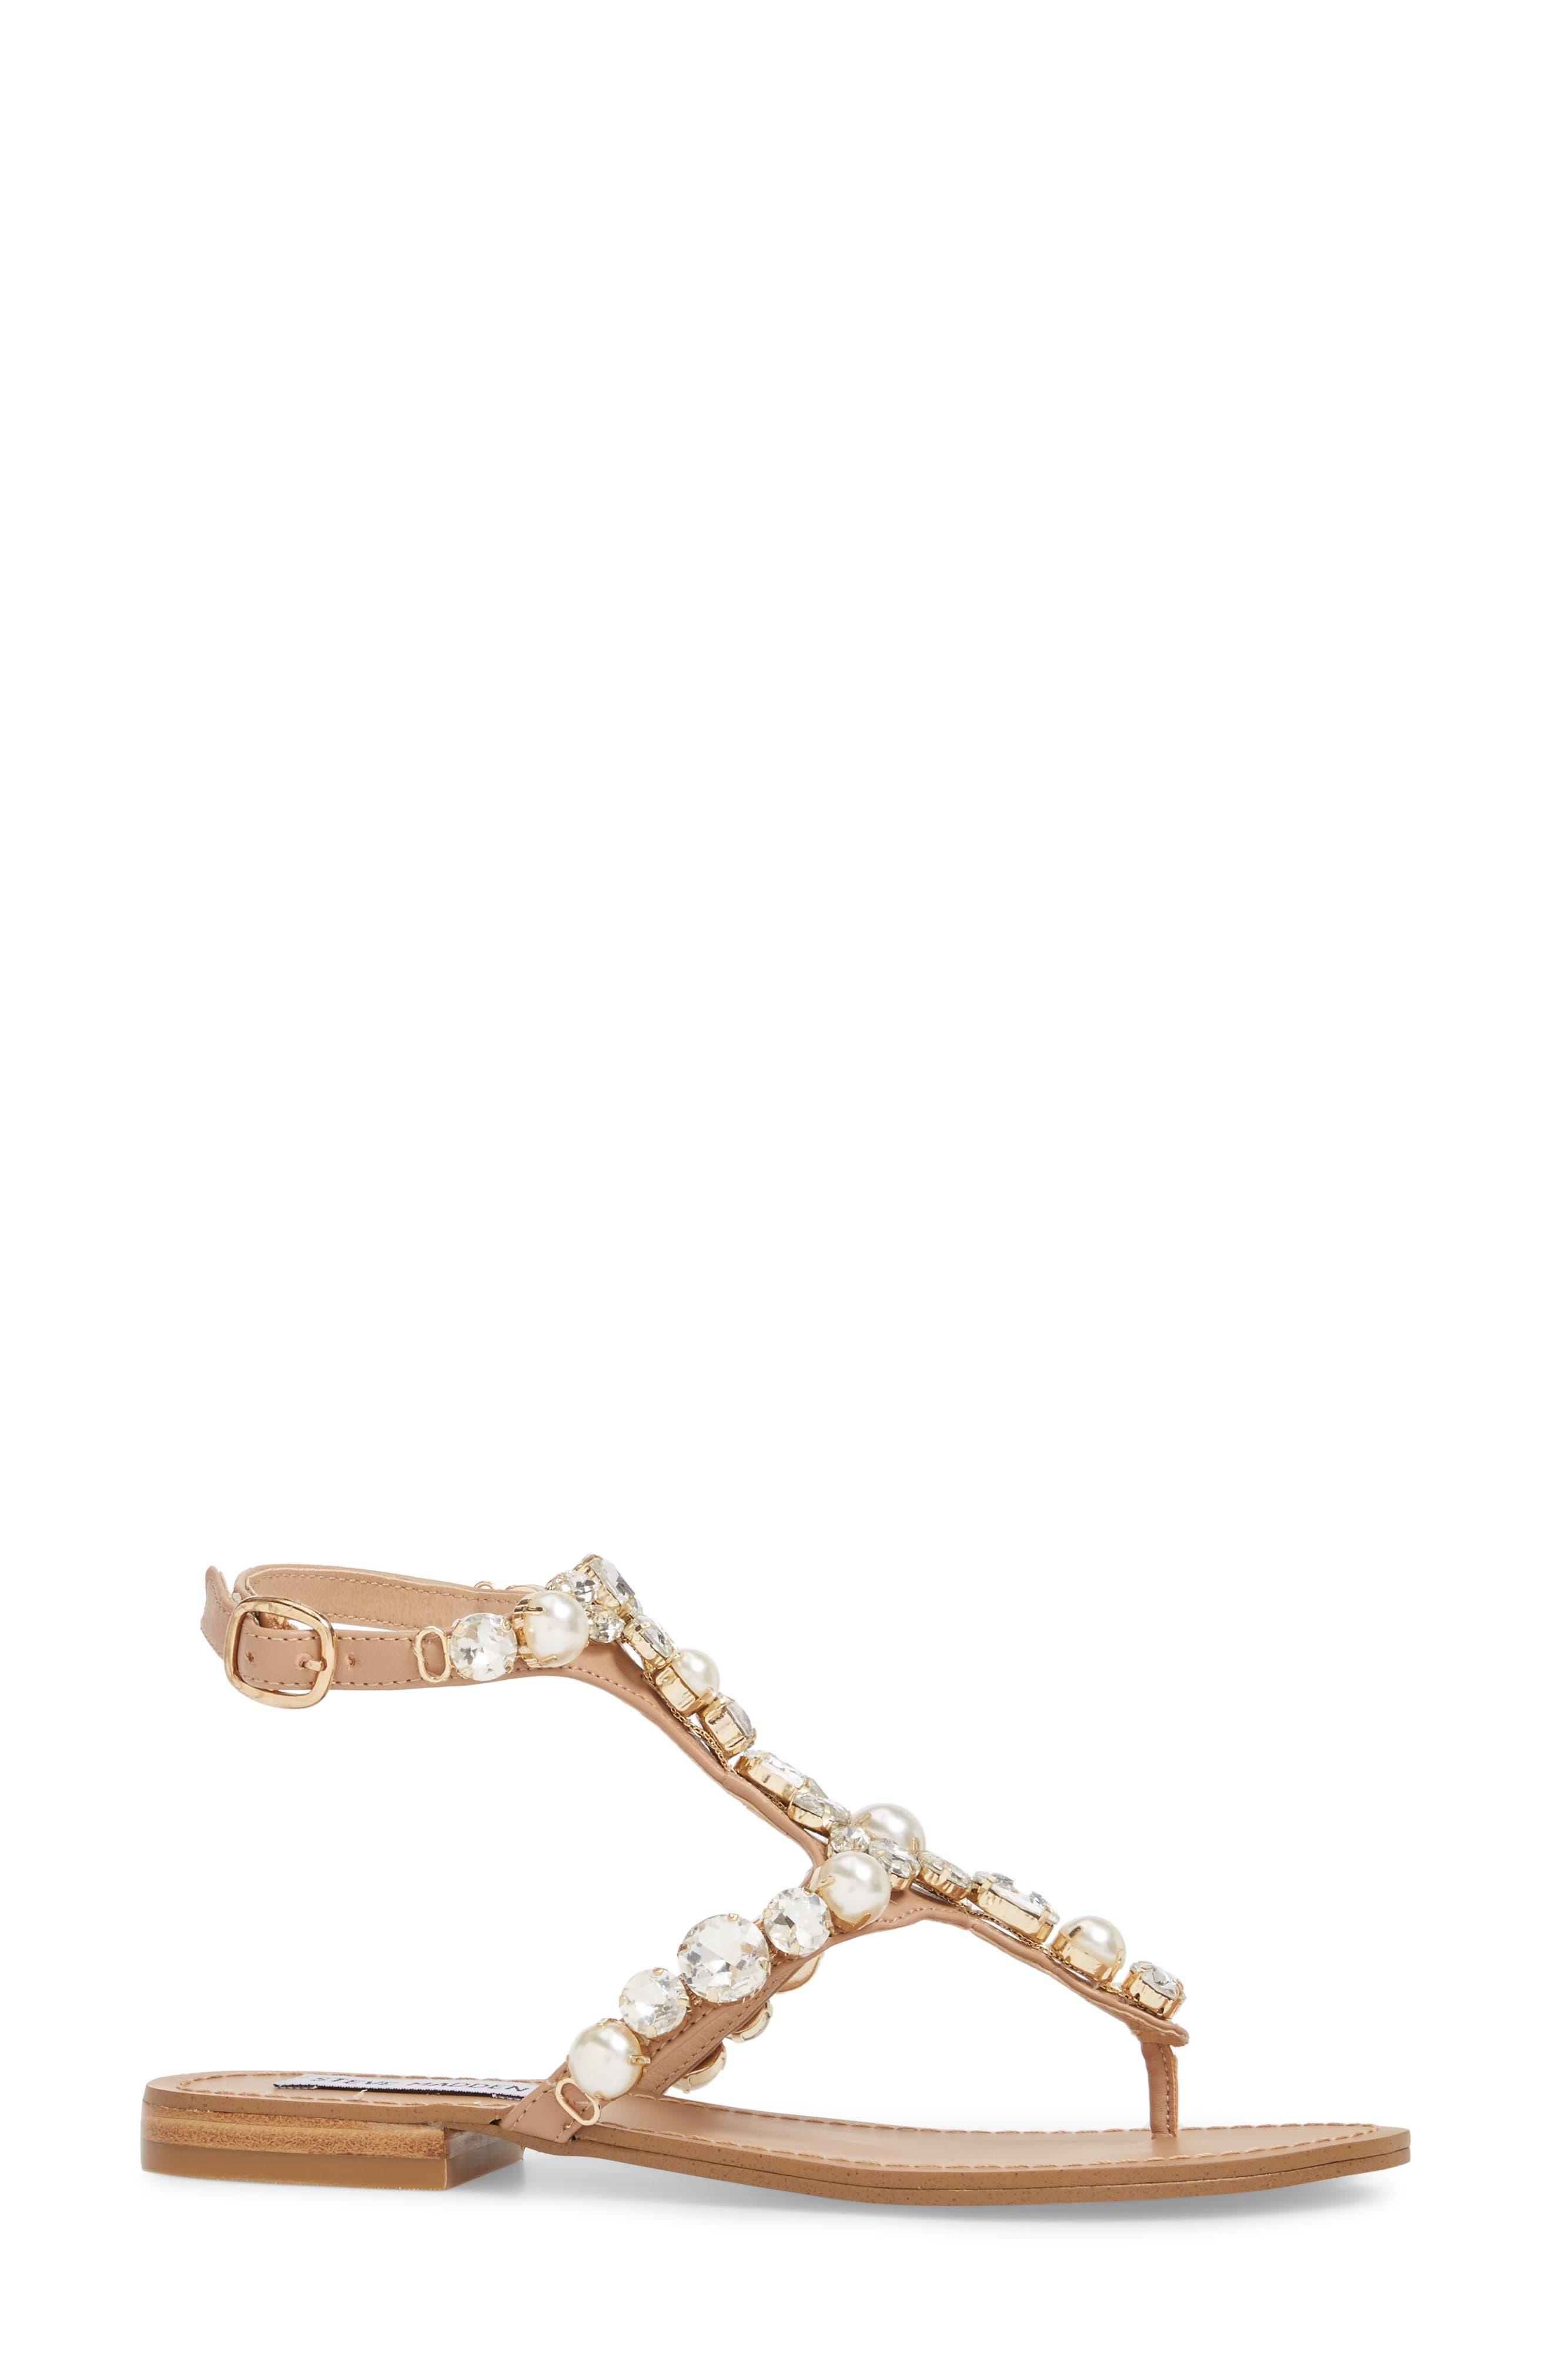 Chantel Crystal Embellished Sandal,                             Alternate thumbnail 6, color,